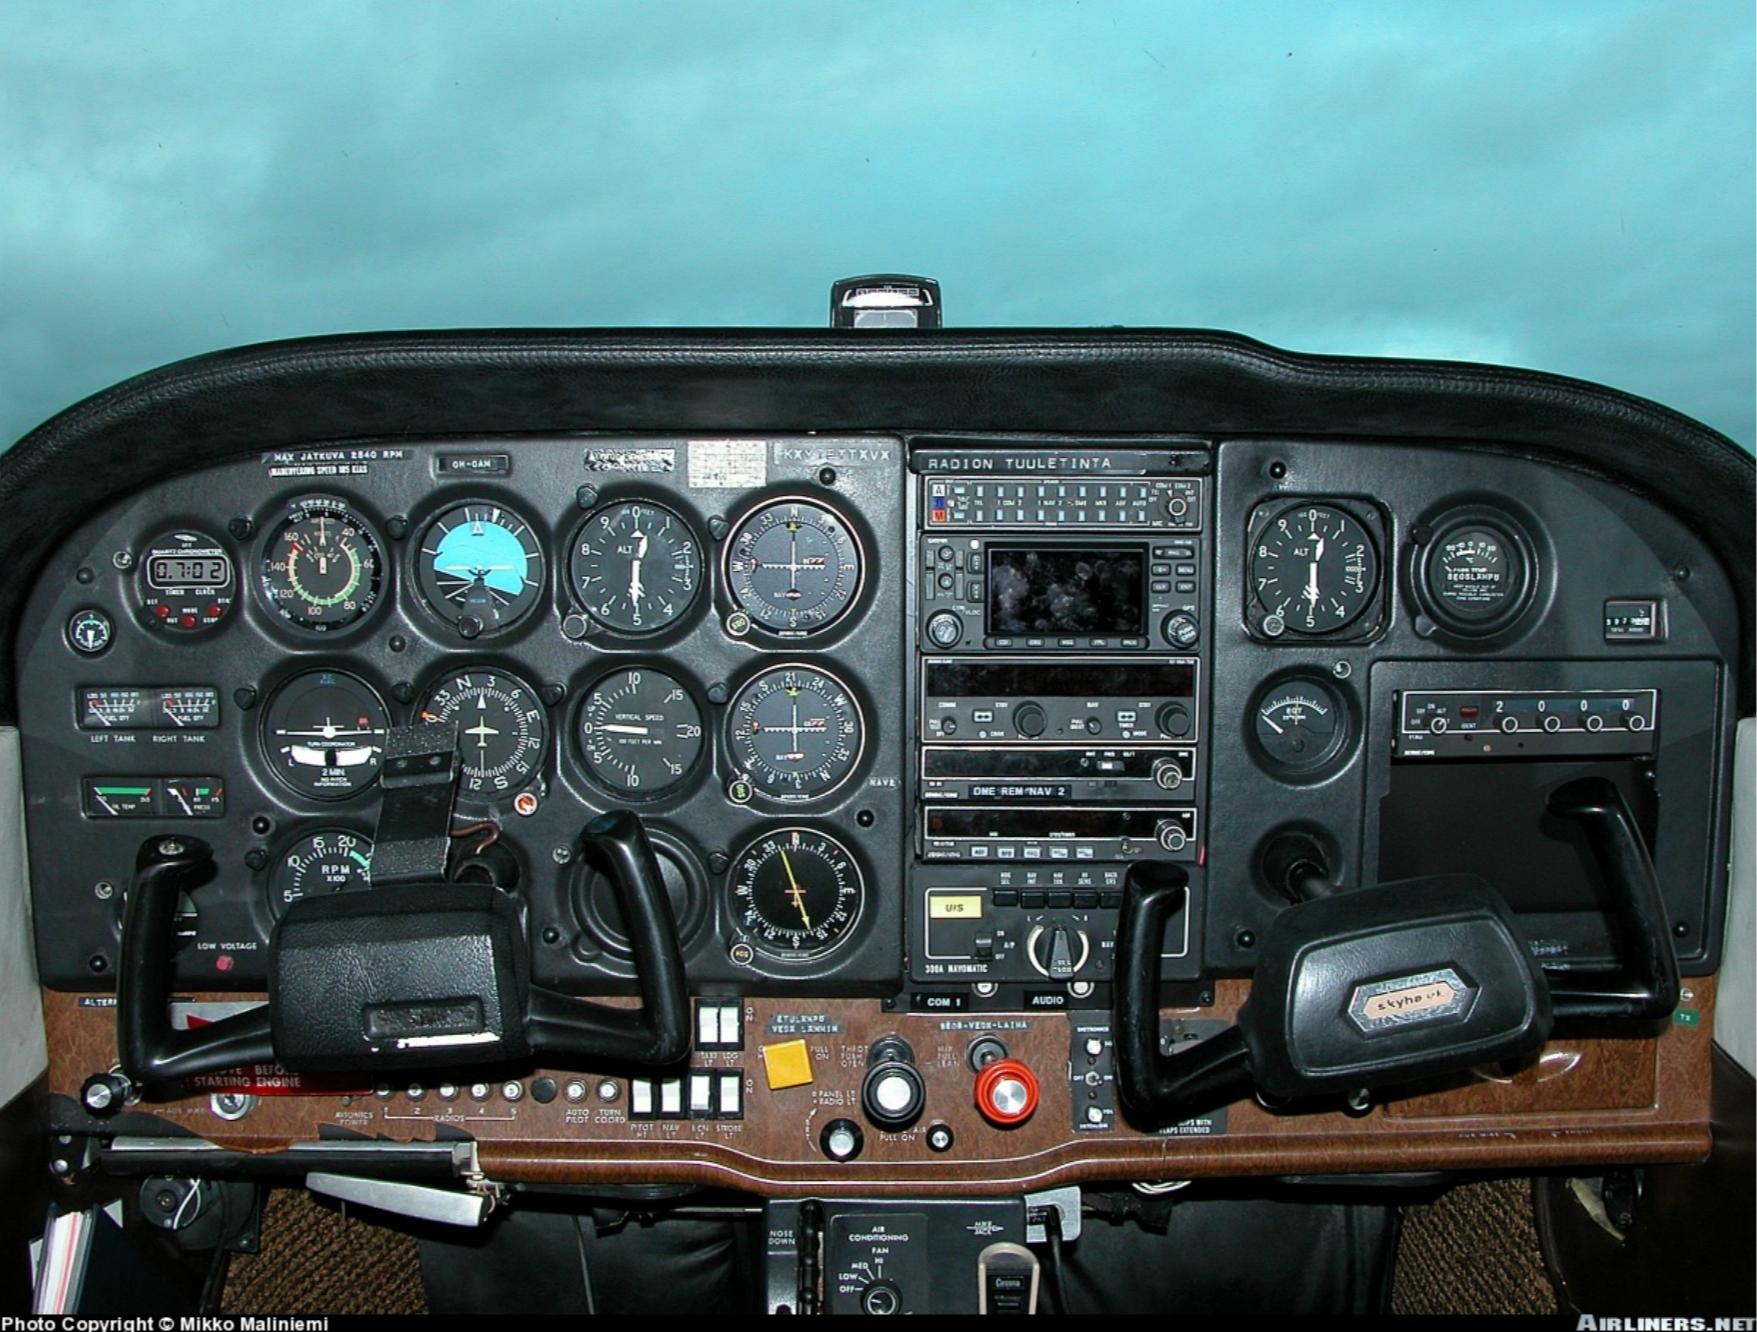 avionics wiring diagram symbols intermediate switch uk cessna 172 luscombe ~ elsalvadorla